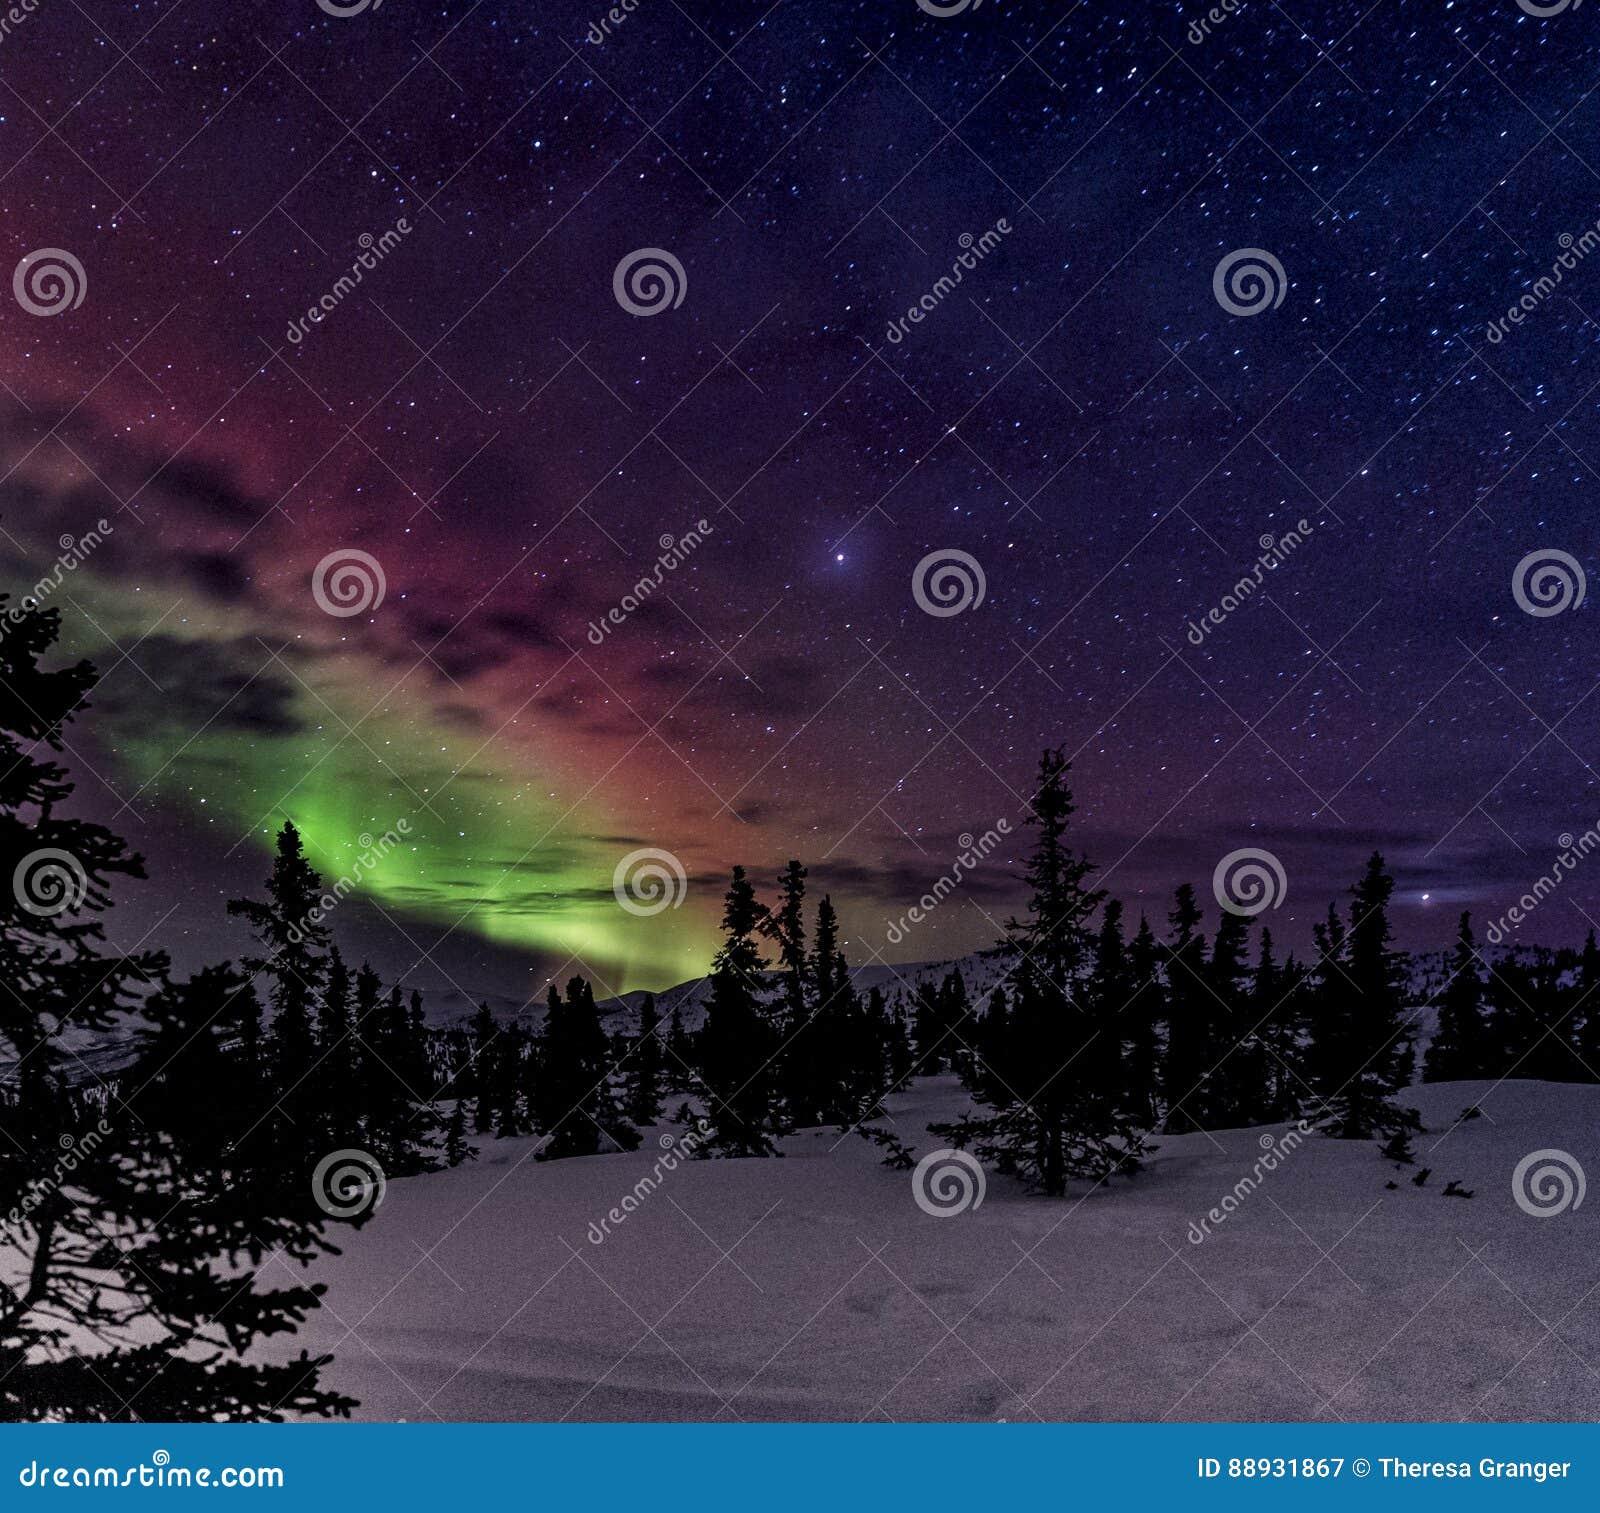 Aurora Sky Stock Image. Image Of Phenomenon, Cold